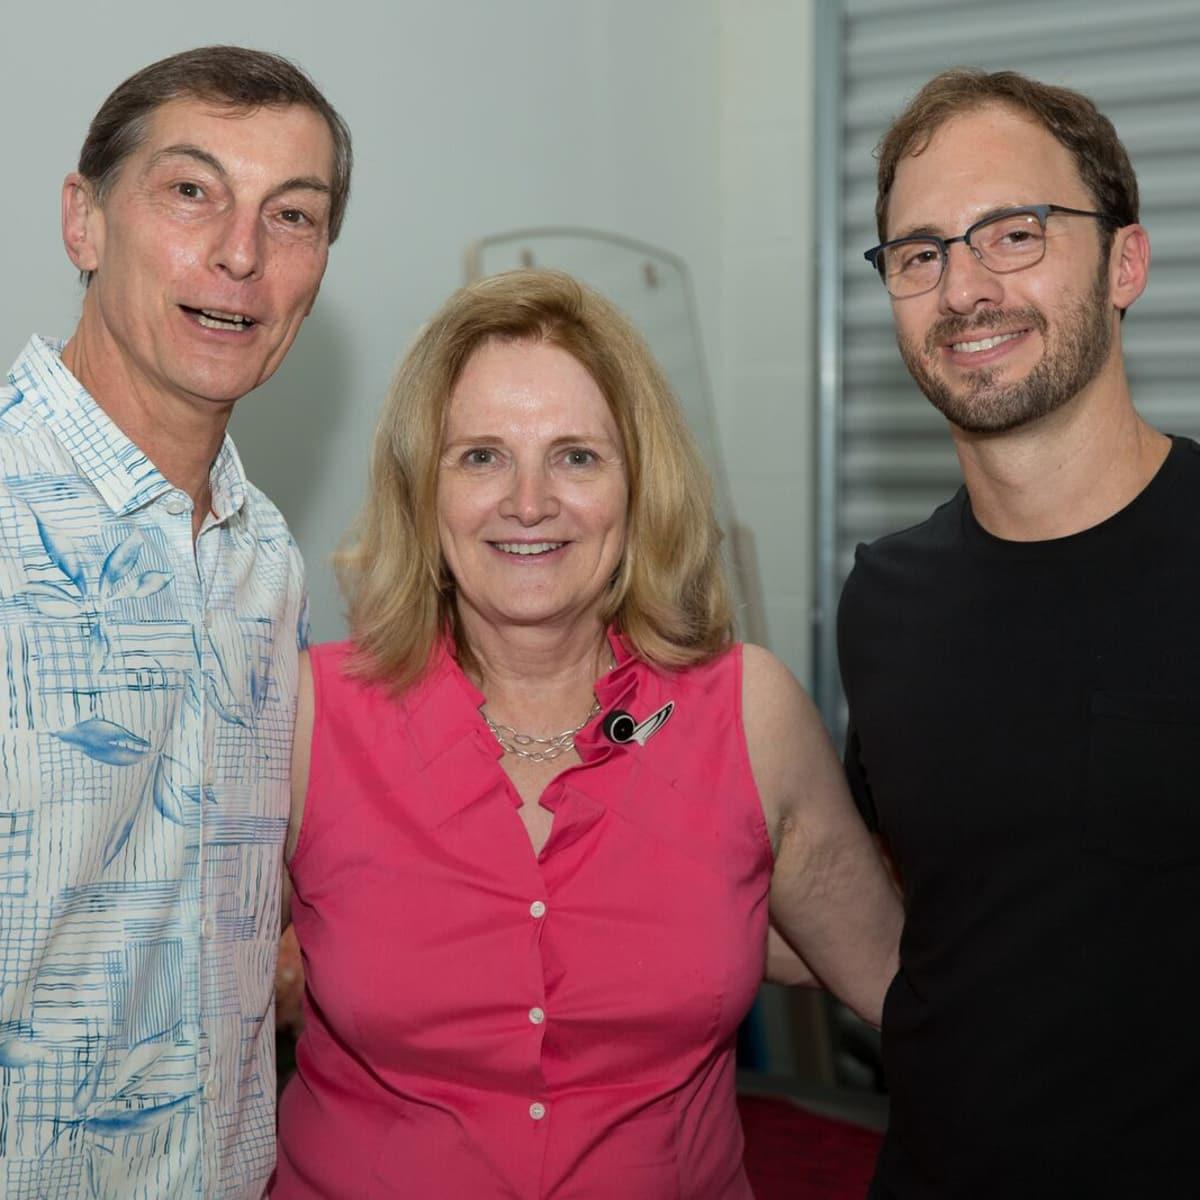 News, Shelby, Opera in the Heights party, August 2015,  Tony Tripodo, Marcia Feldman, Michael Raak